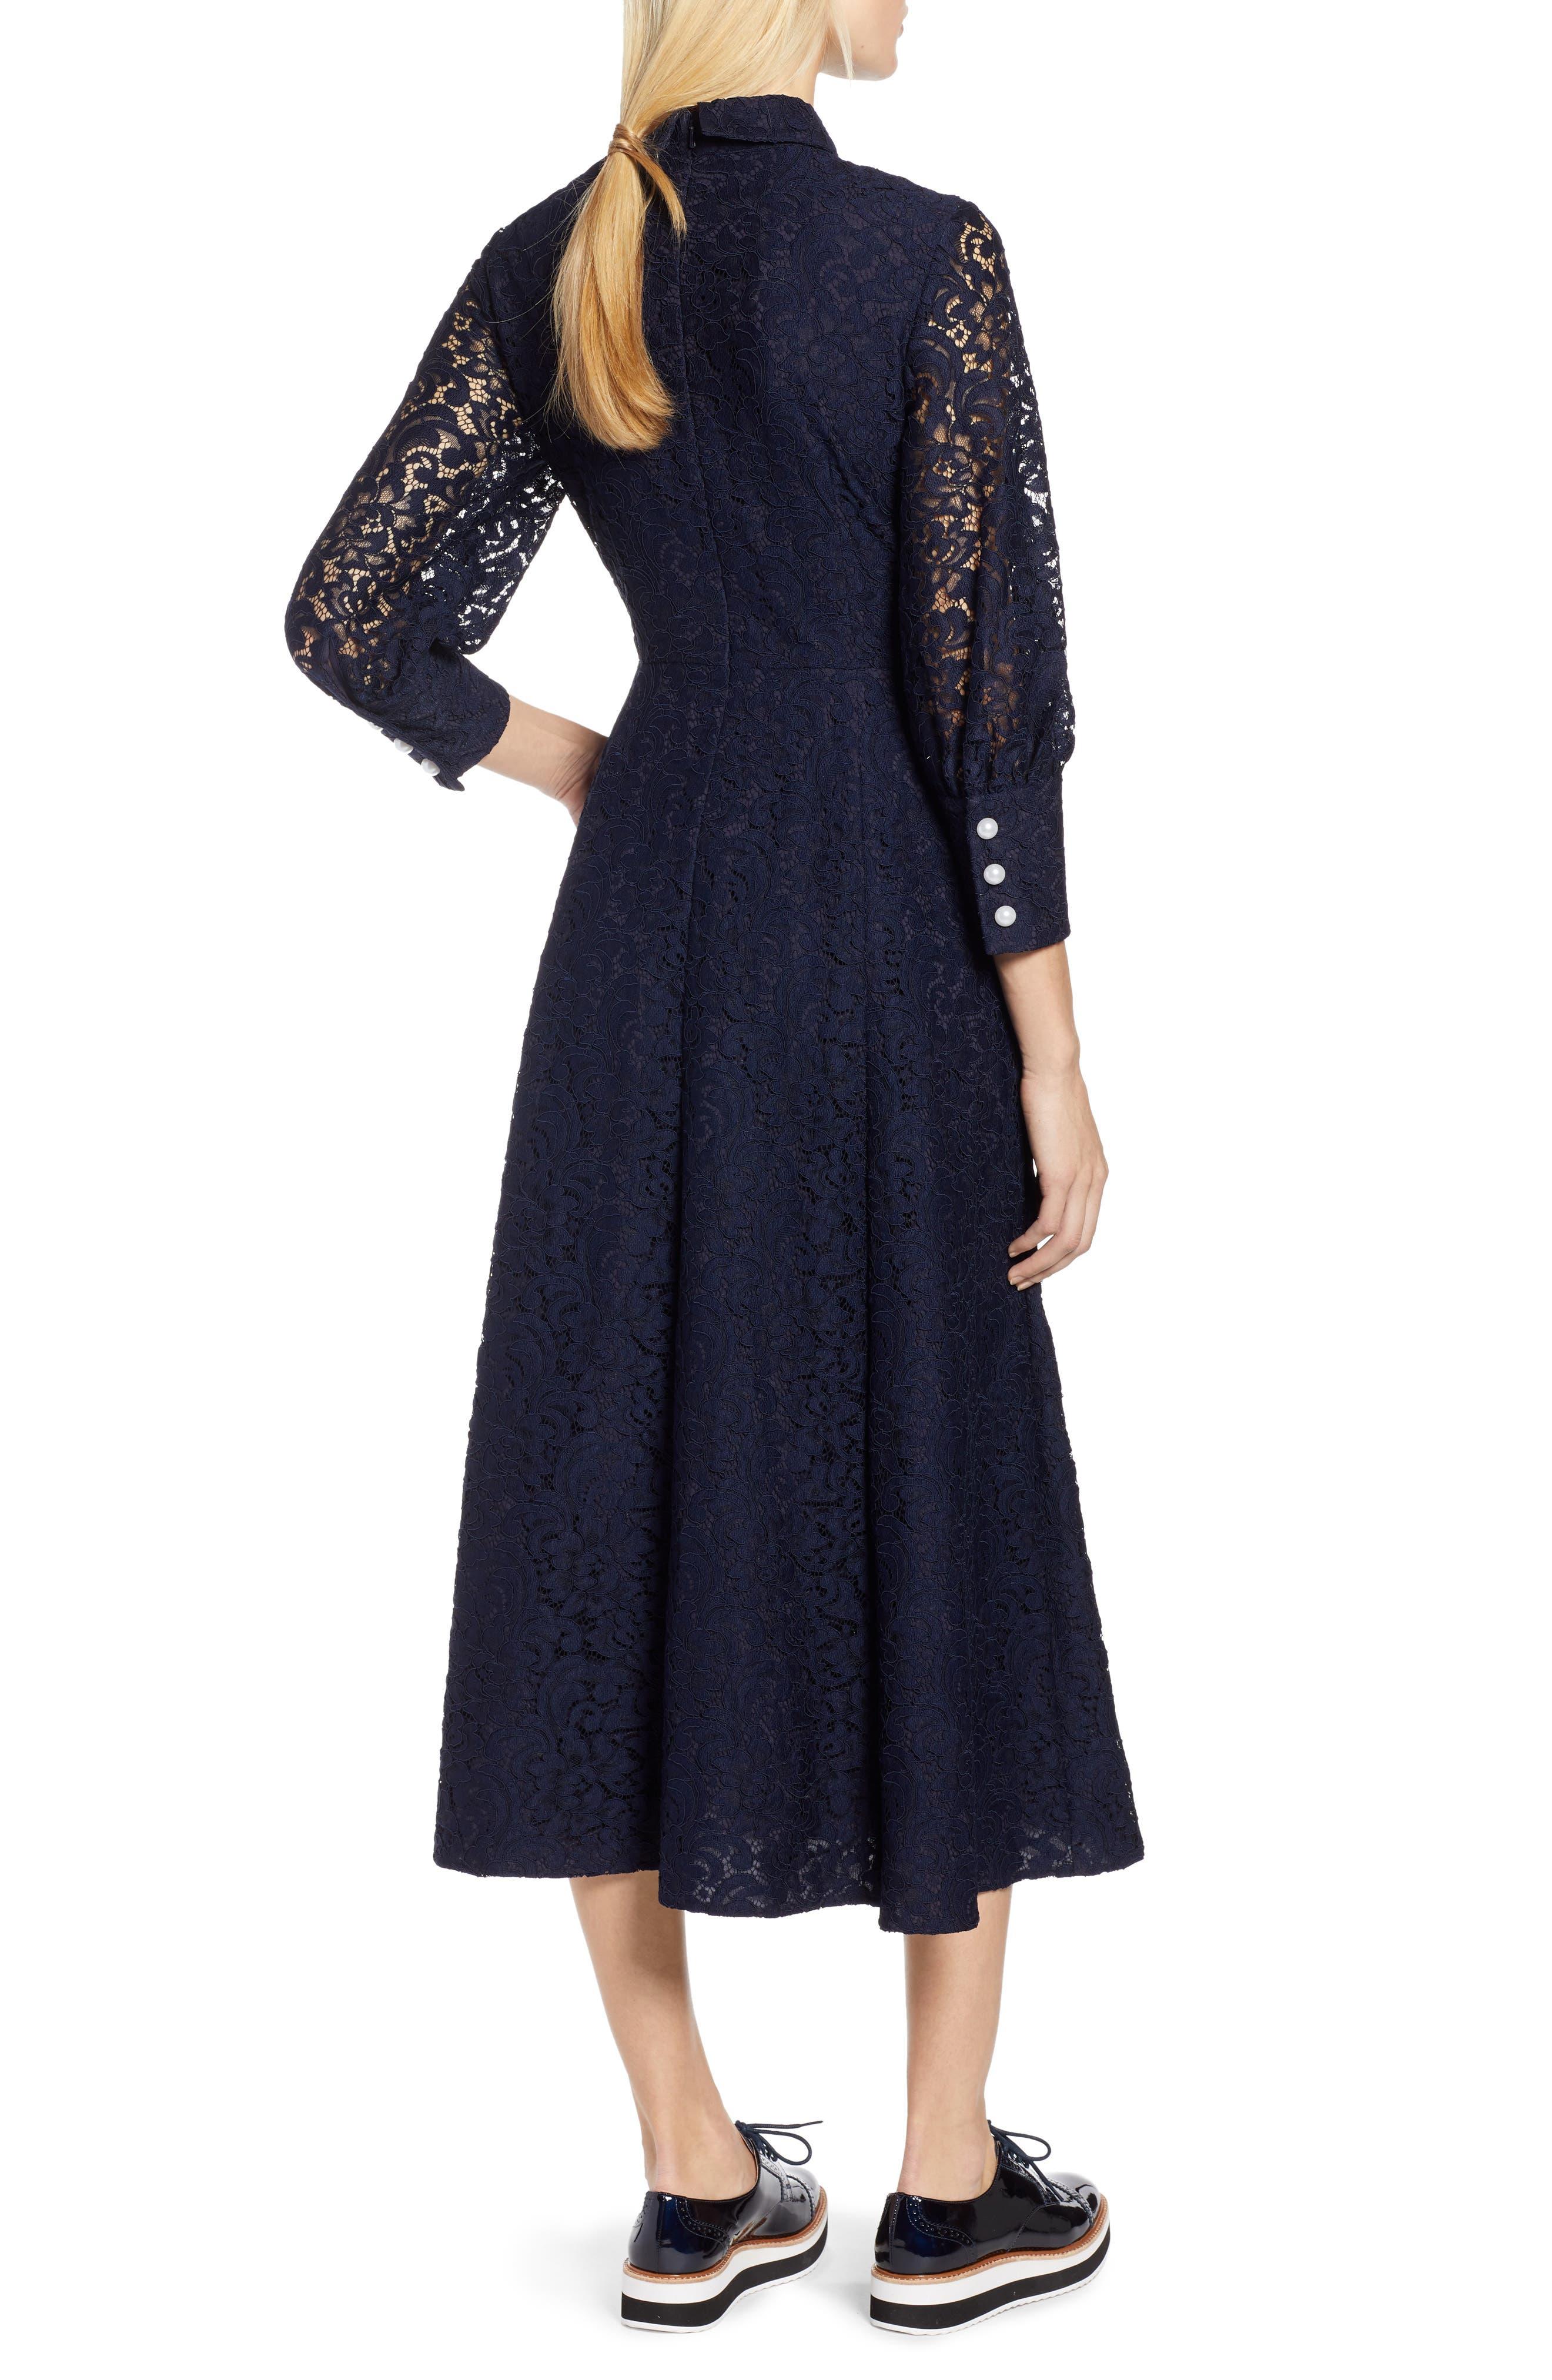 x Atlantic-Pacific Bow Detail Lace Midi Dress,                             Alternate thumbnail 3, color,                             NAVY